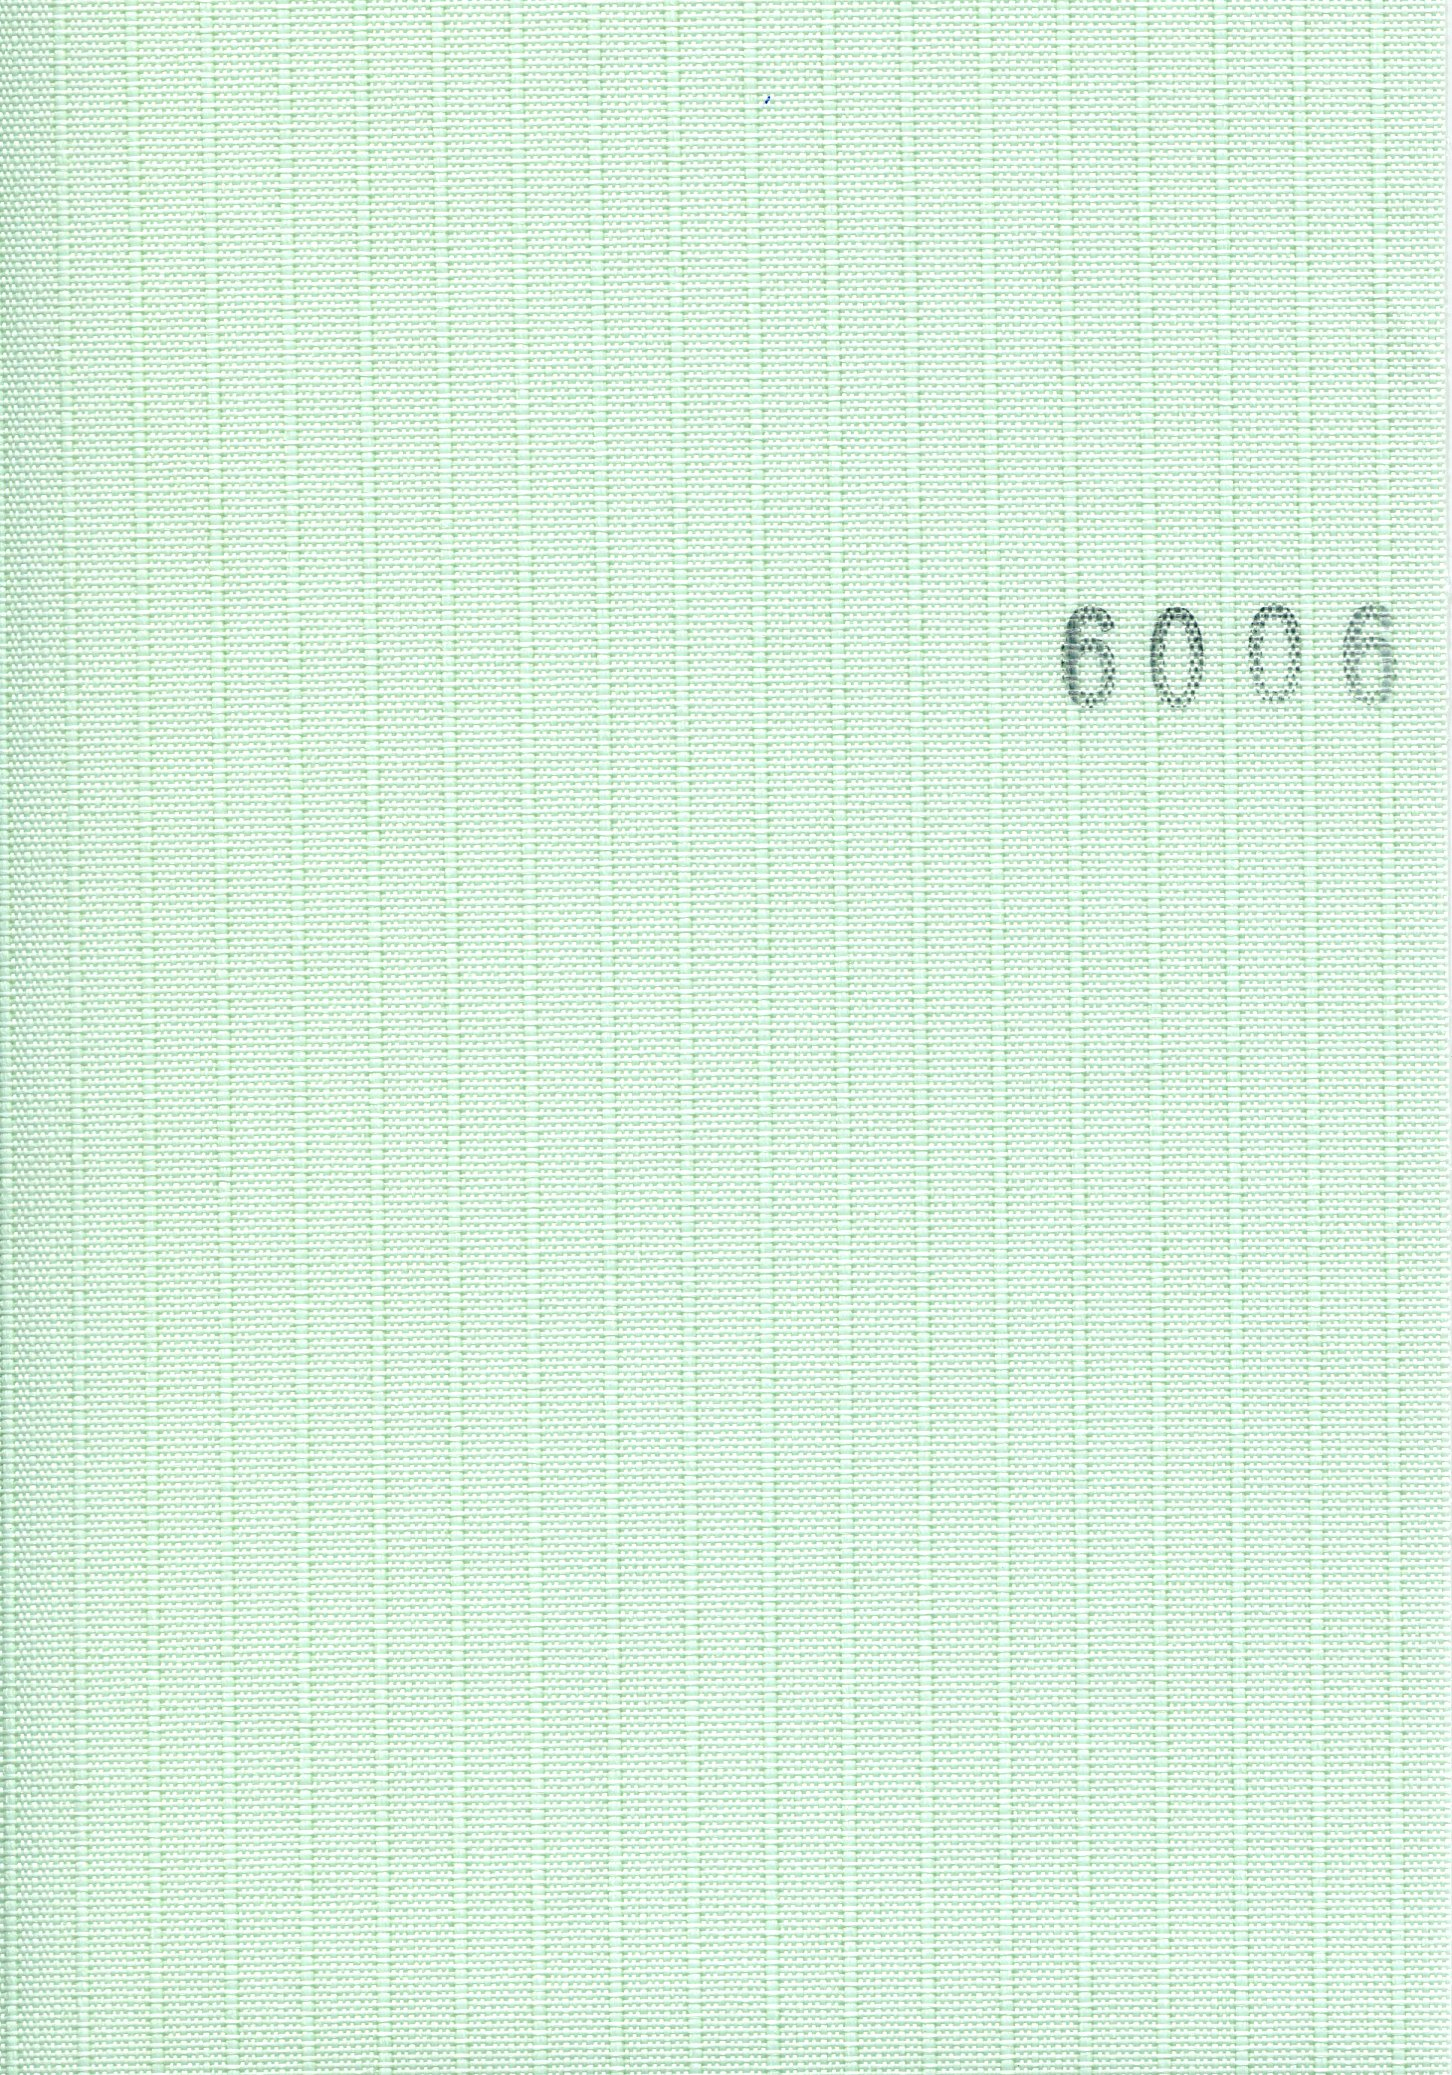 Line 6006